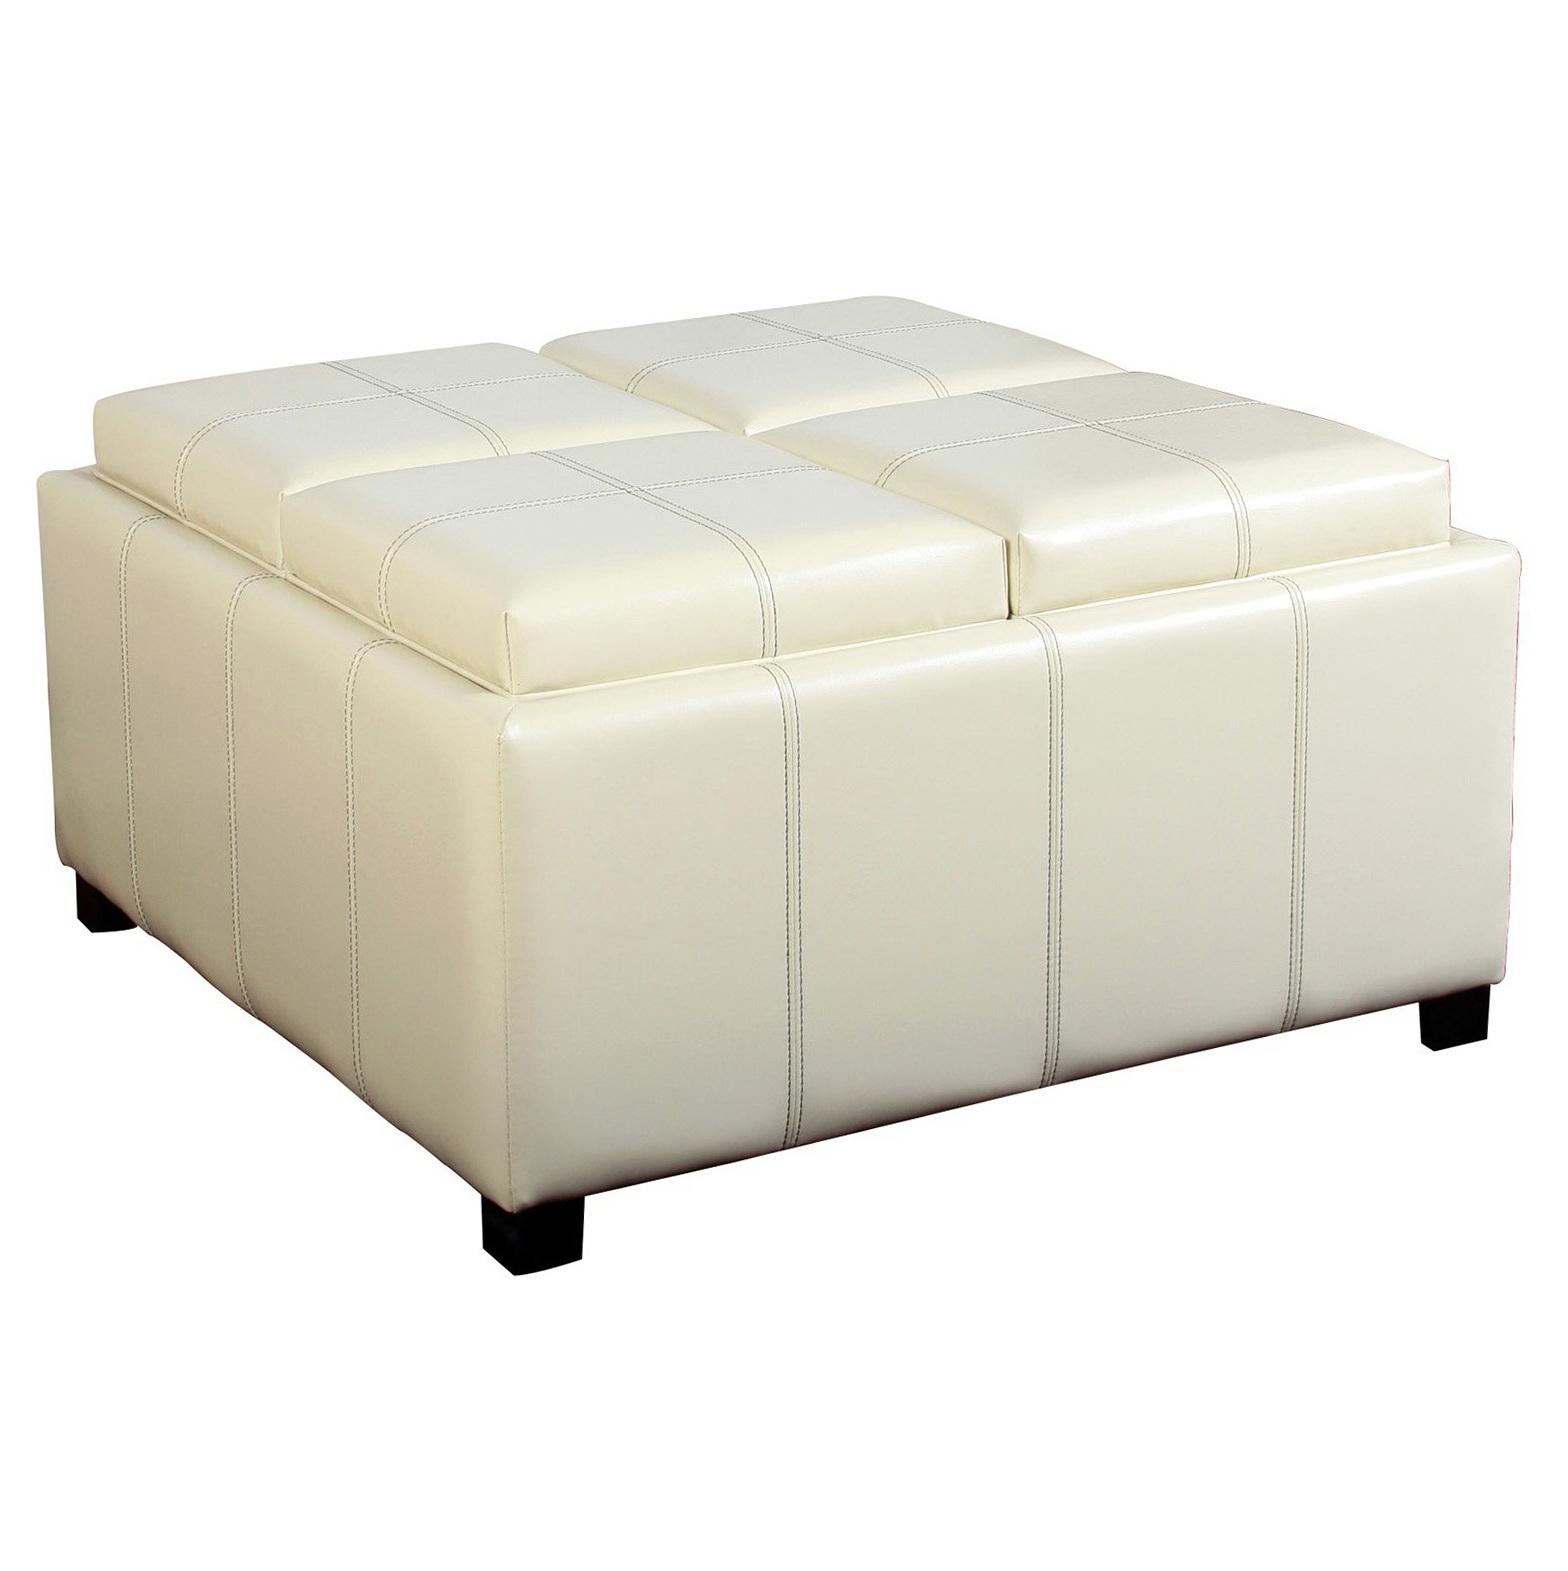 White Leather Ottoman Coffee Table